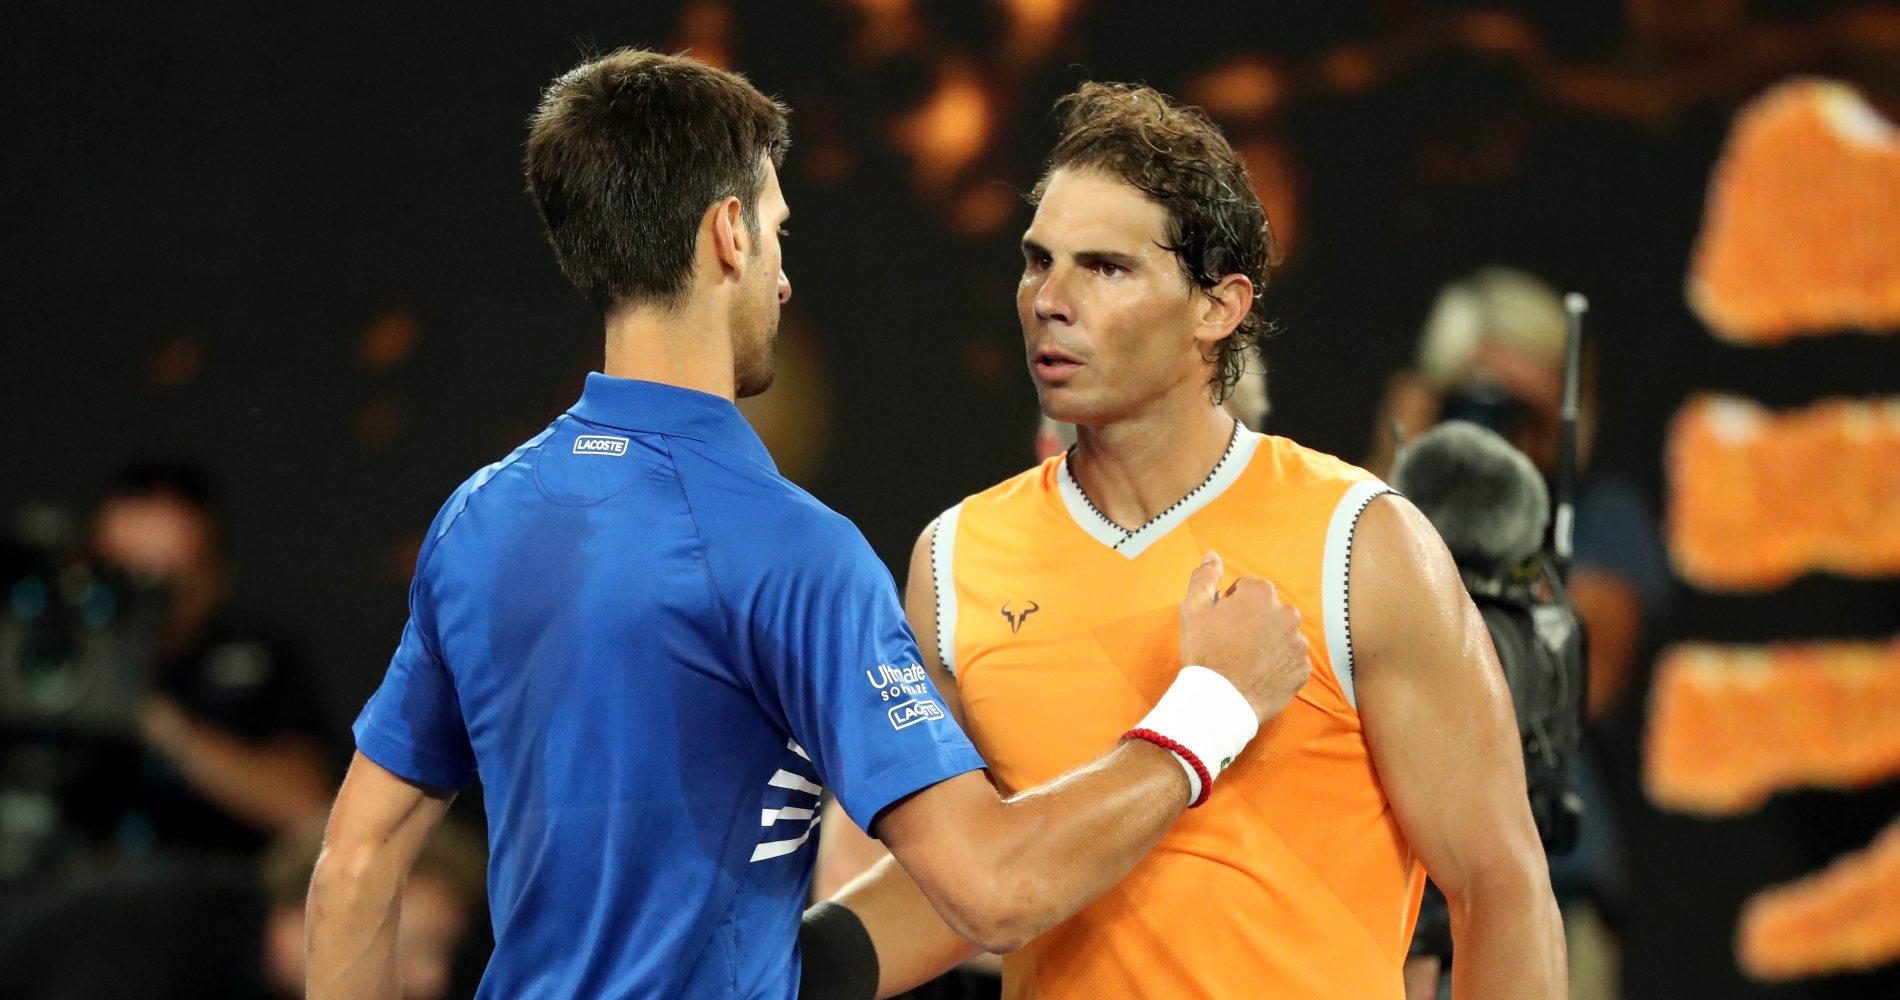 Novak Djokovic and Rafael Nadal, Australian Open 2019